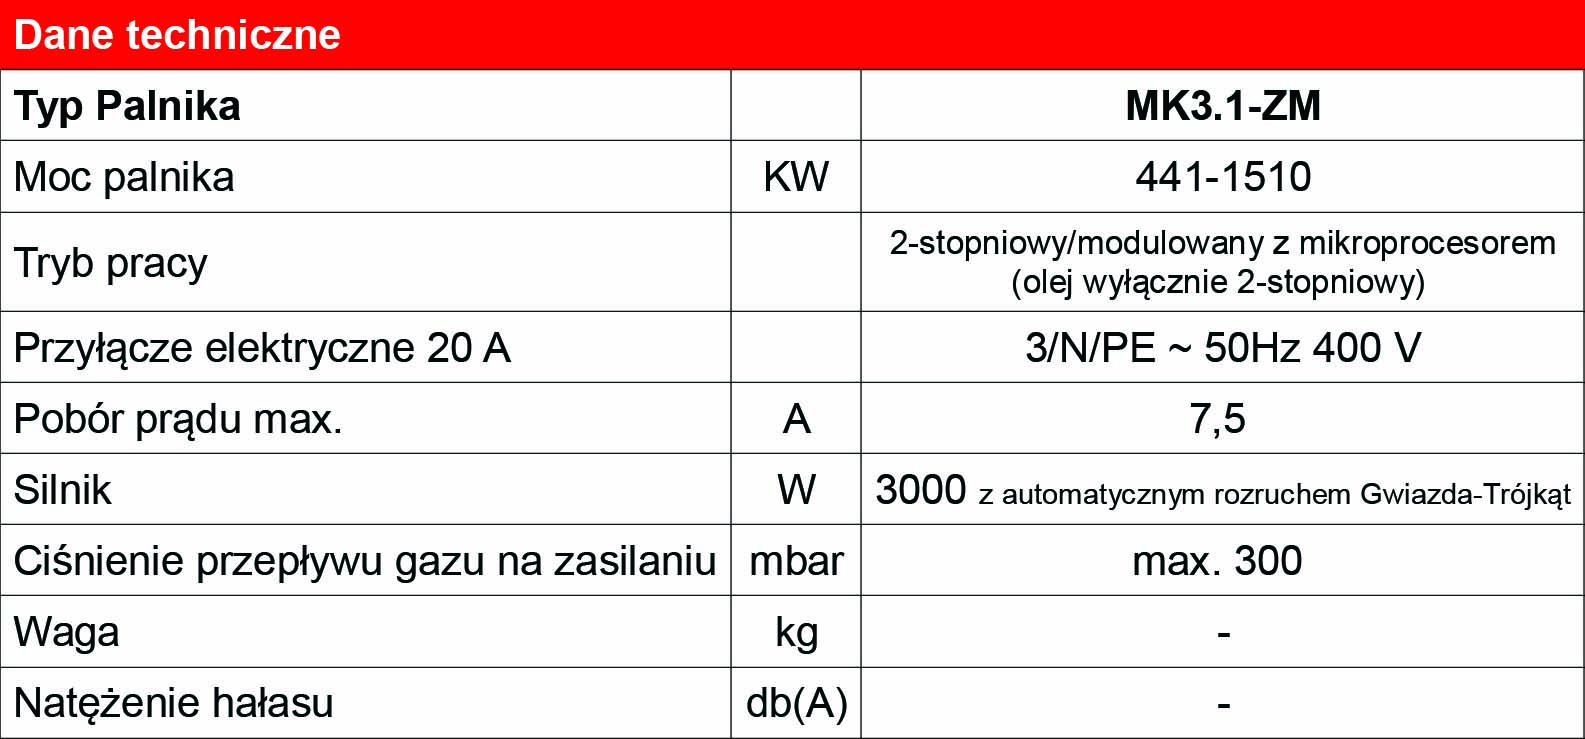 dane_techniczne_MK3_1